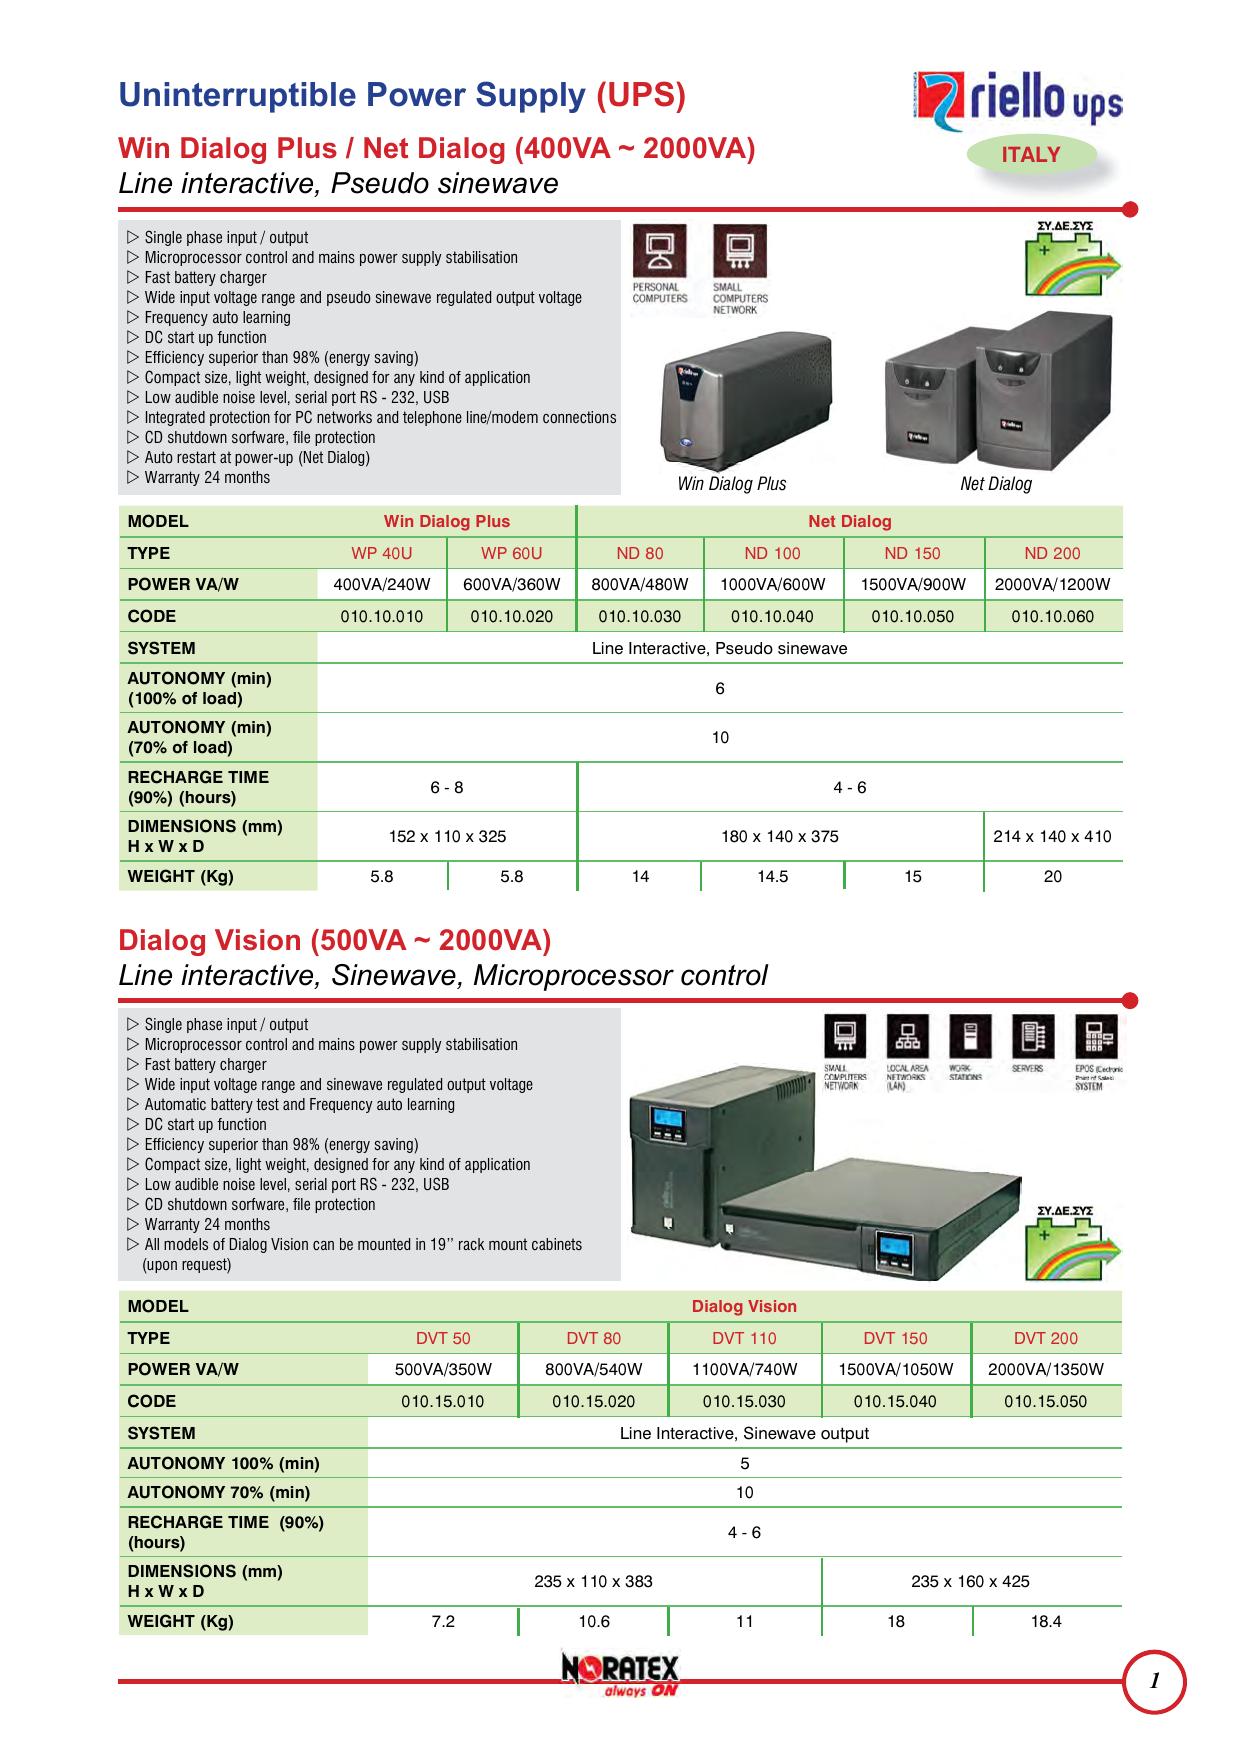 Uninterruptible Power Supply Ups 138 Volt 20 A Transformerless Circuit Diagram